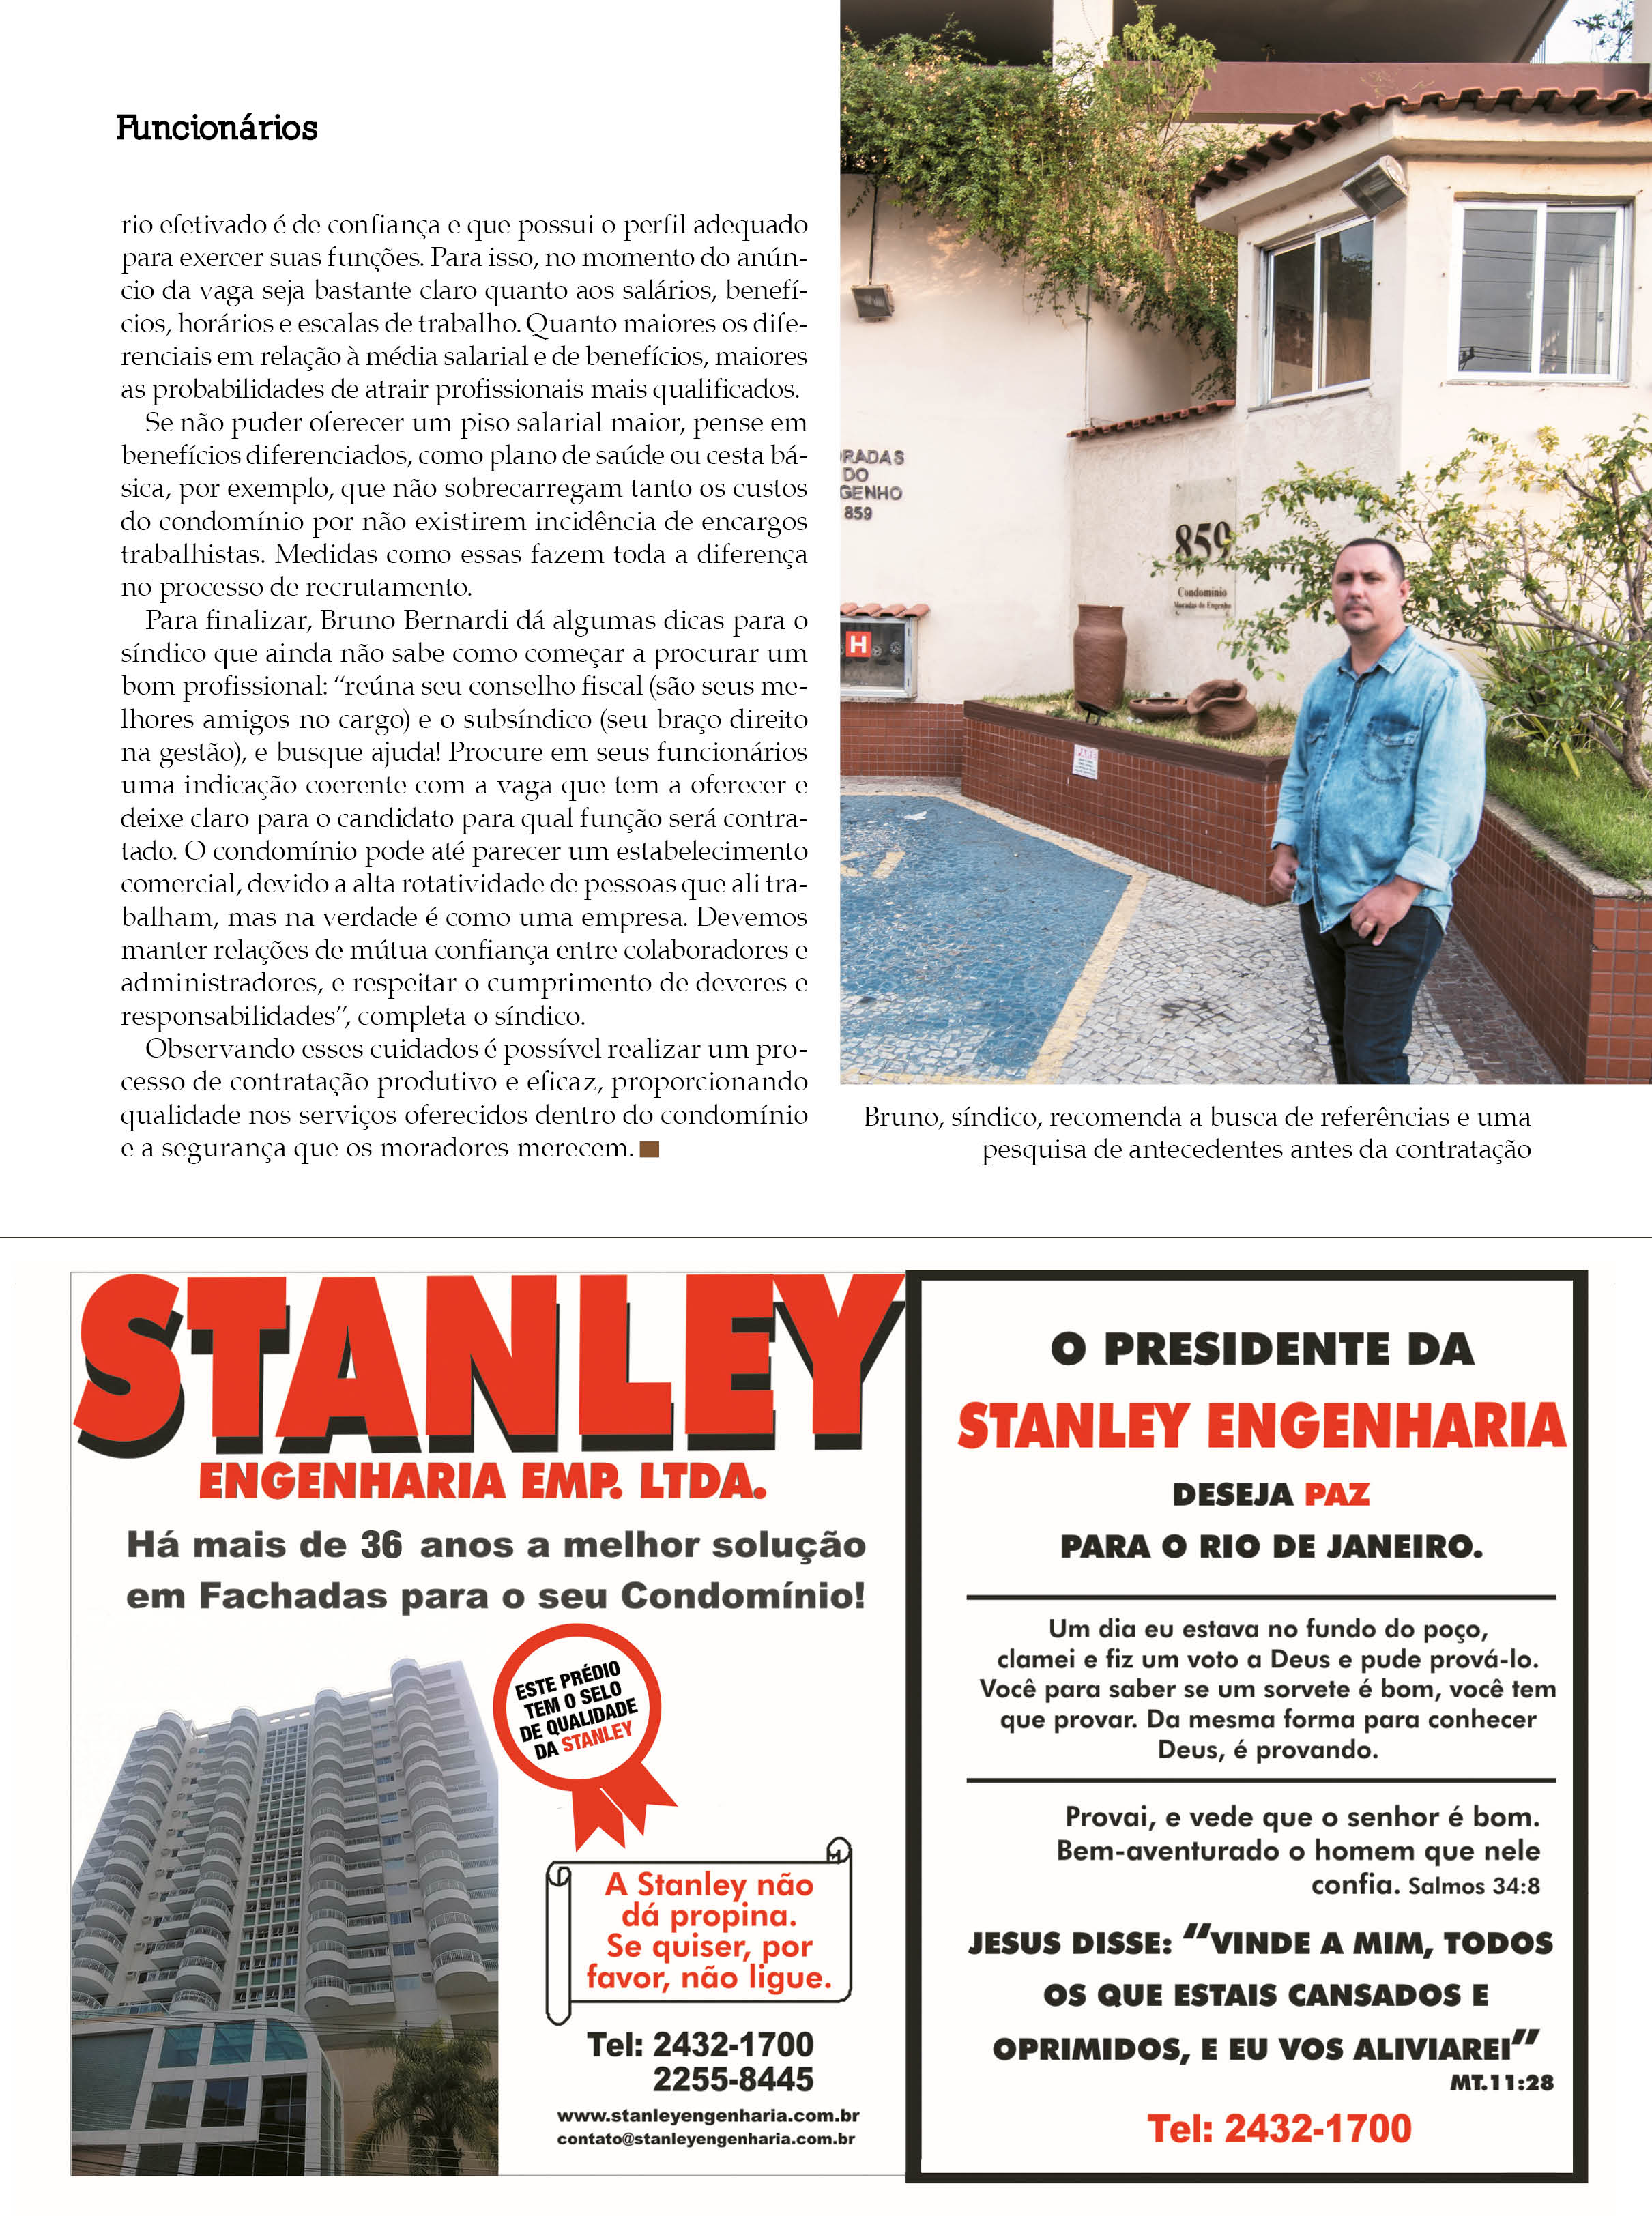 Revista Síndico_ed 246_22